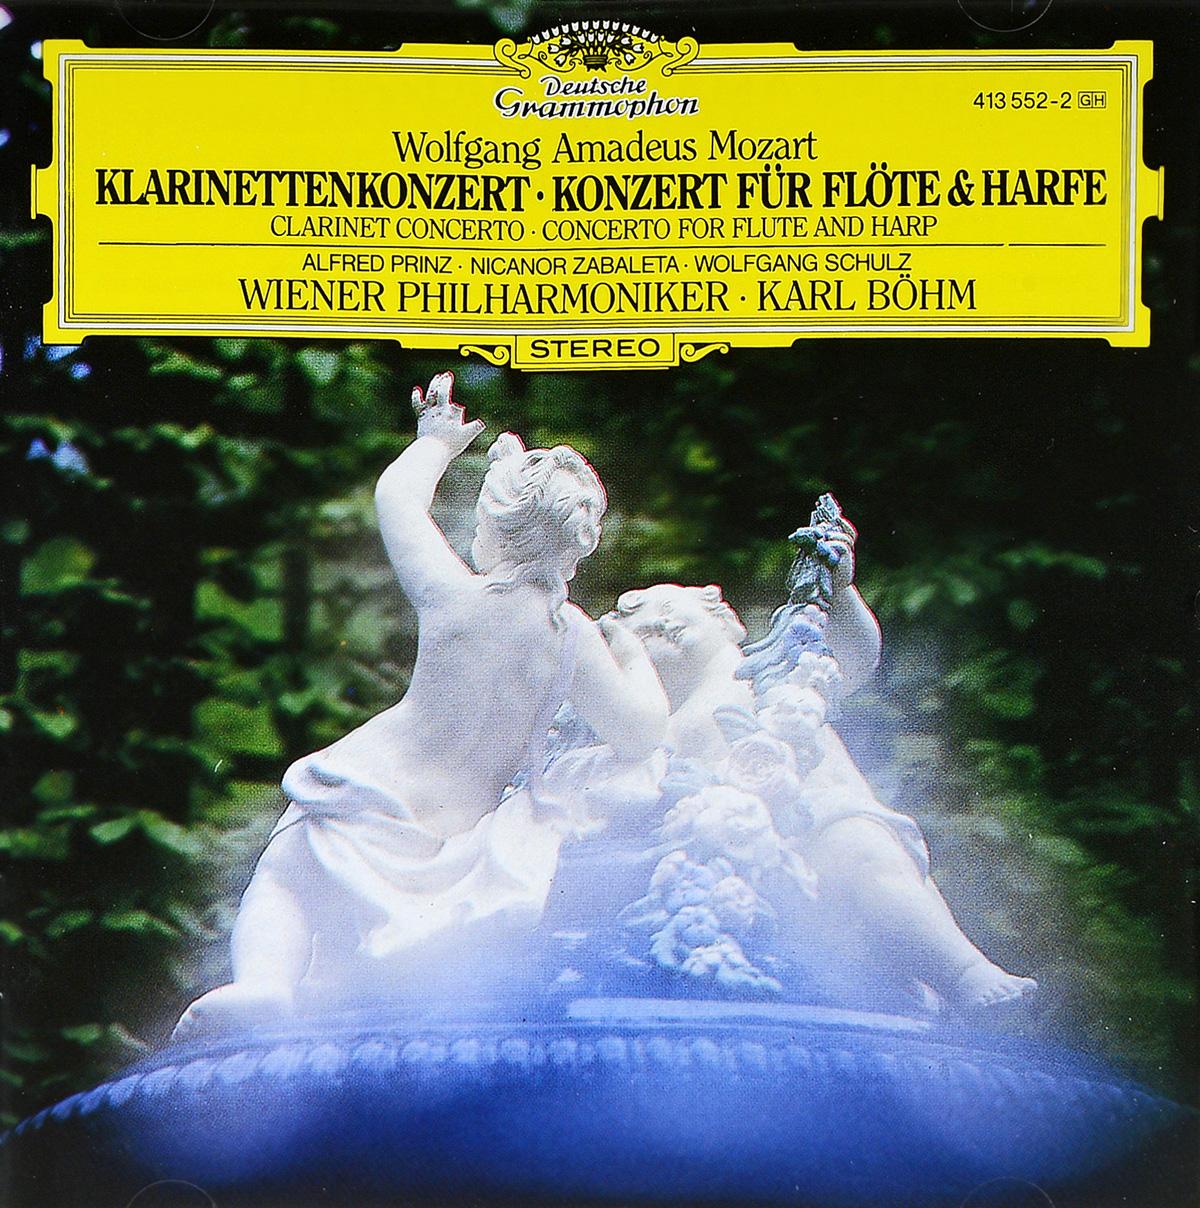 Карл Боэм Karl Boehm. Mozart: Clarinet Concerto, Flute & Harp Concerto карл боэм karl boehm mozart the abduction from the serail 2 cd